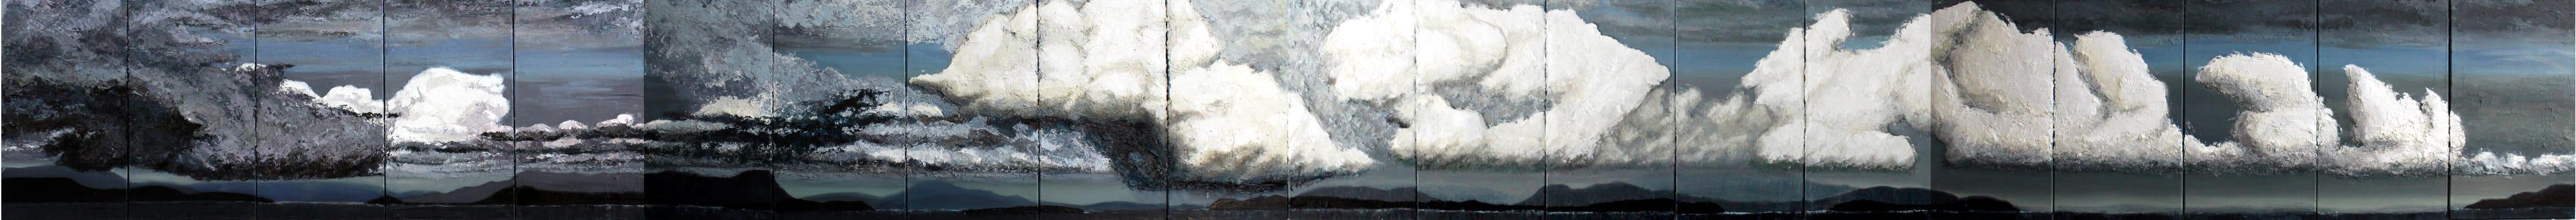 Karolina Jarmolinska, Paradies, 2015, 70x800cm, Oel, Asche, Leinwand